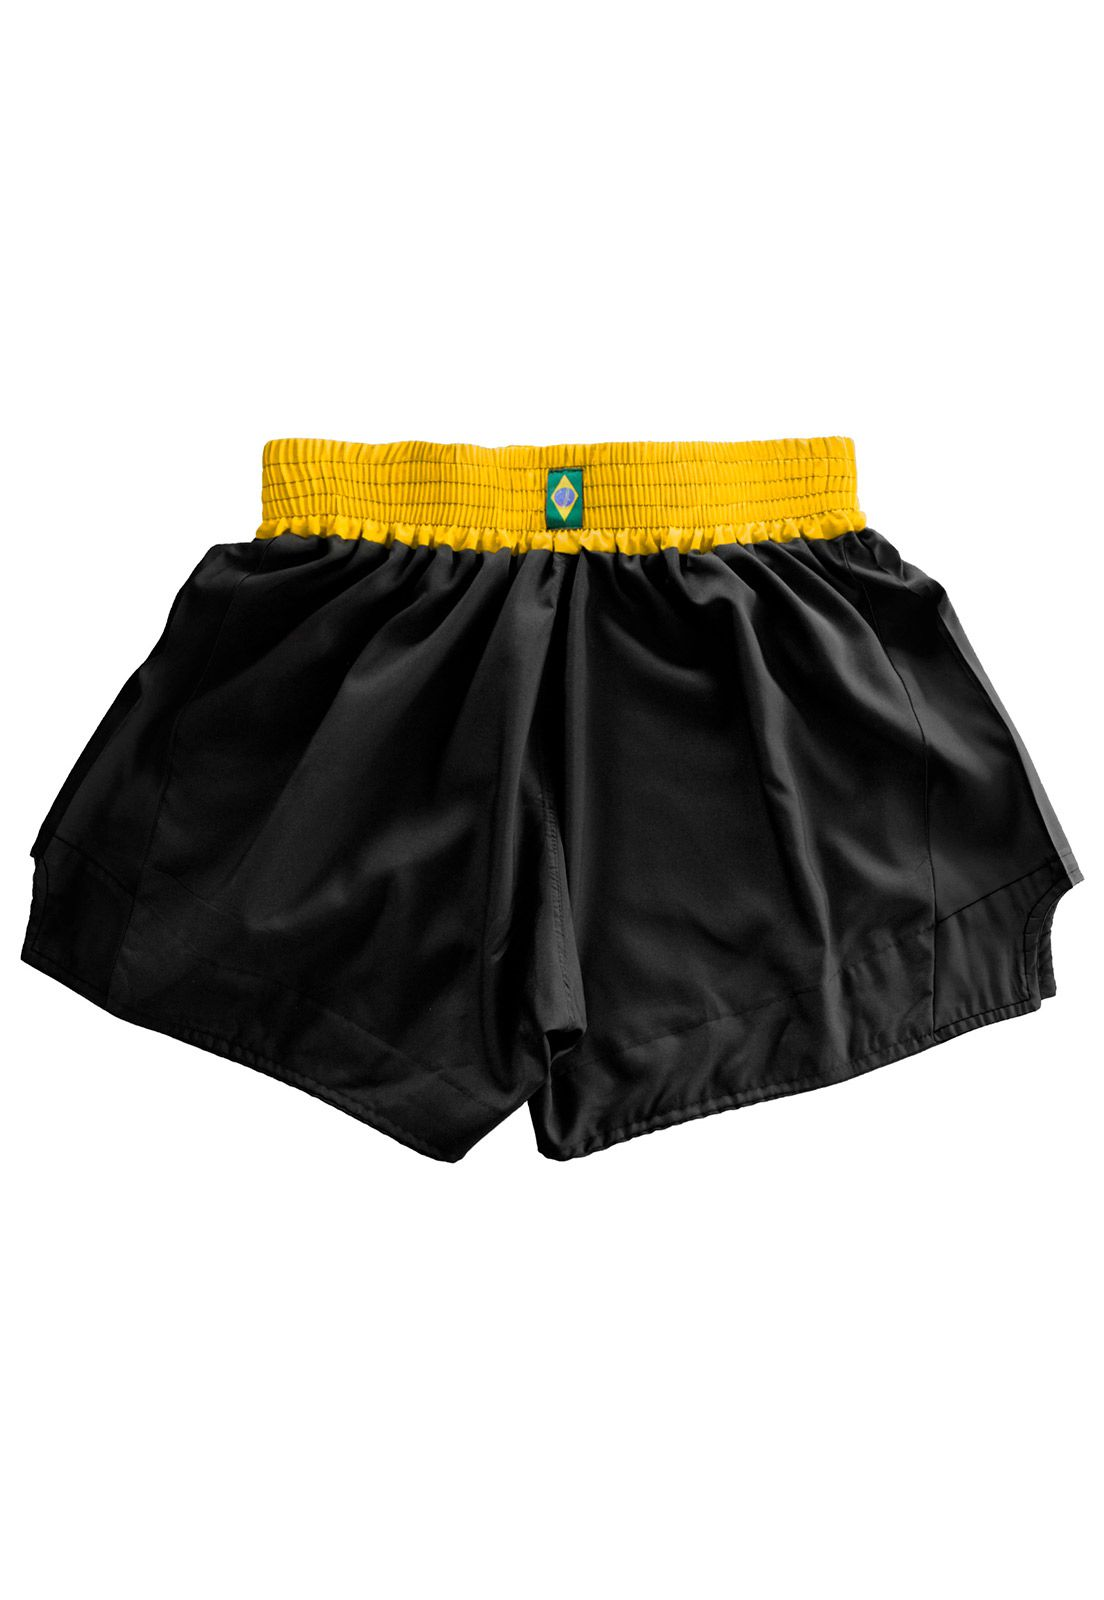 Short Muay Thai Kickboxing Glove Tribal - Preto/Amar